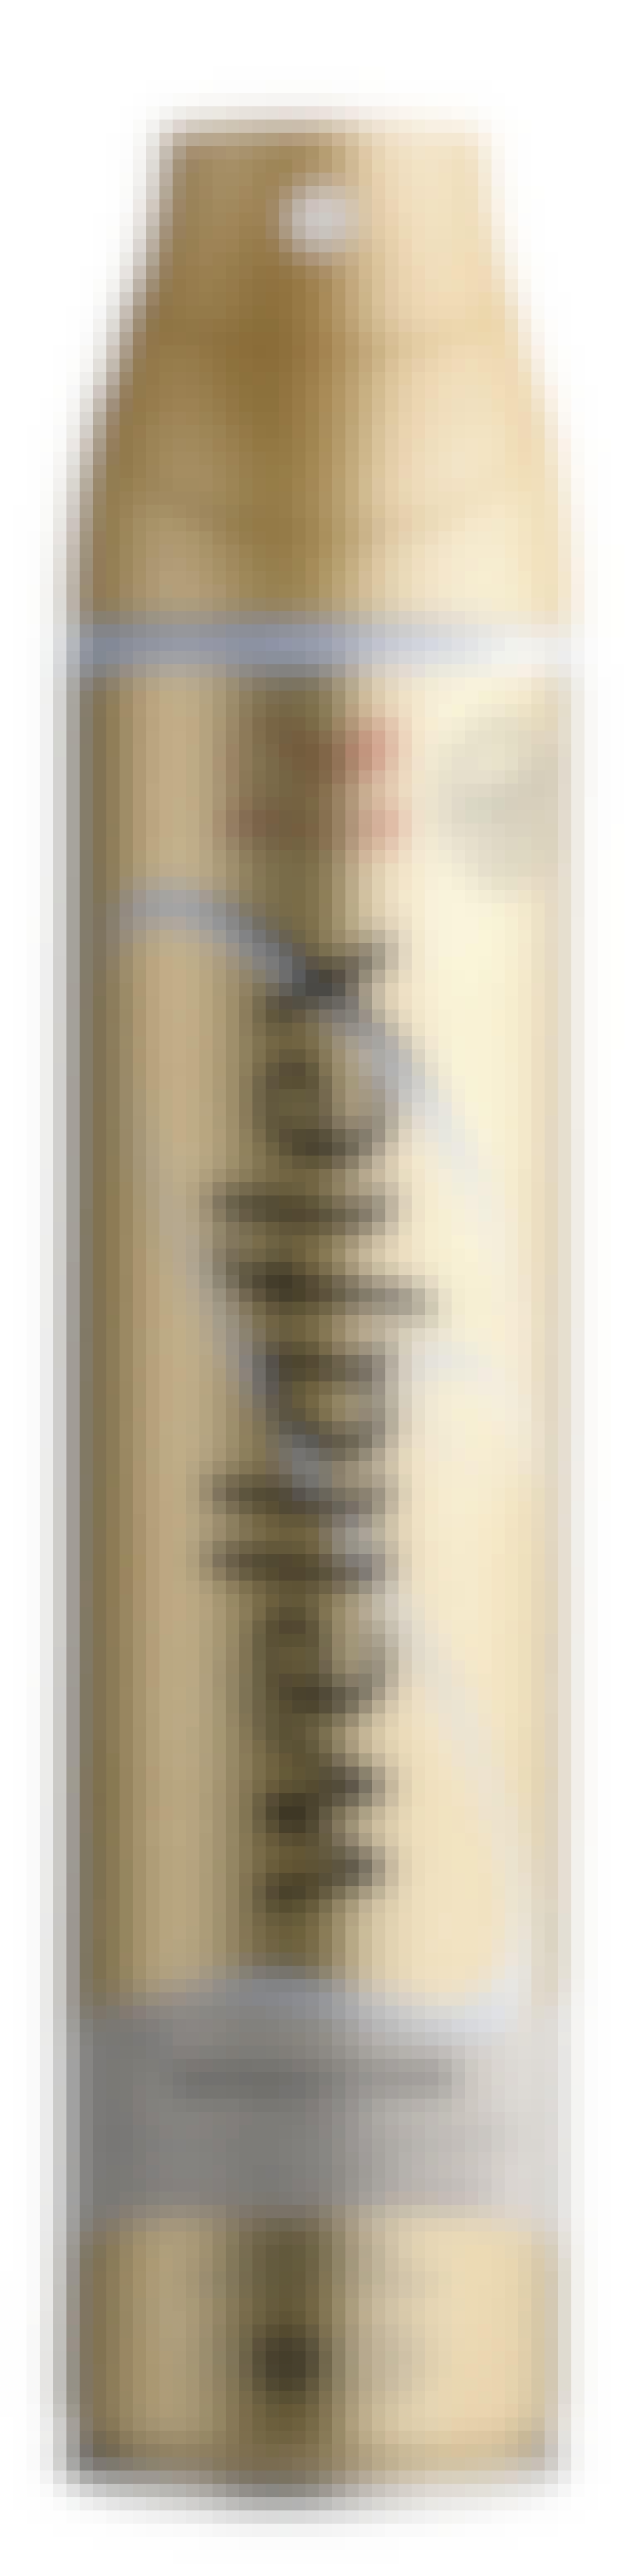 Wellaflex sensitive hairspray fra Wella til 37 kr.